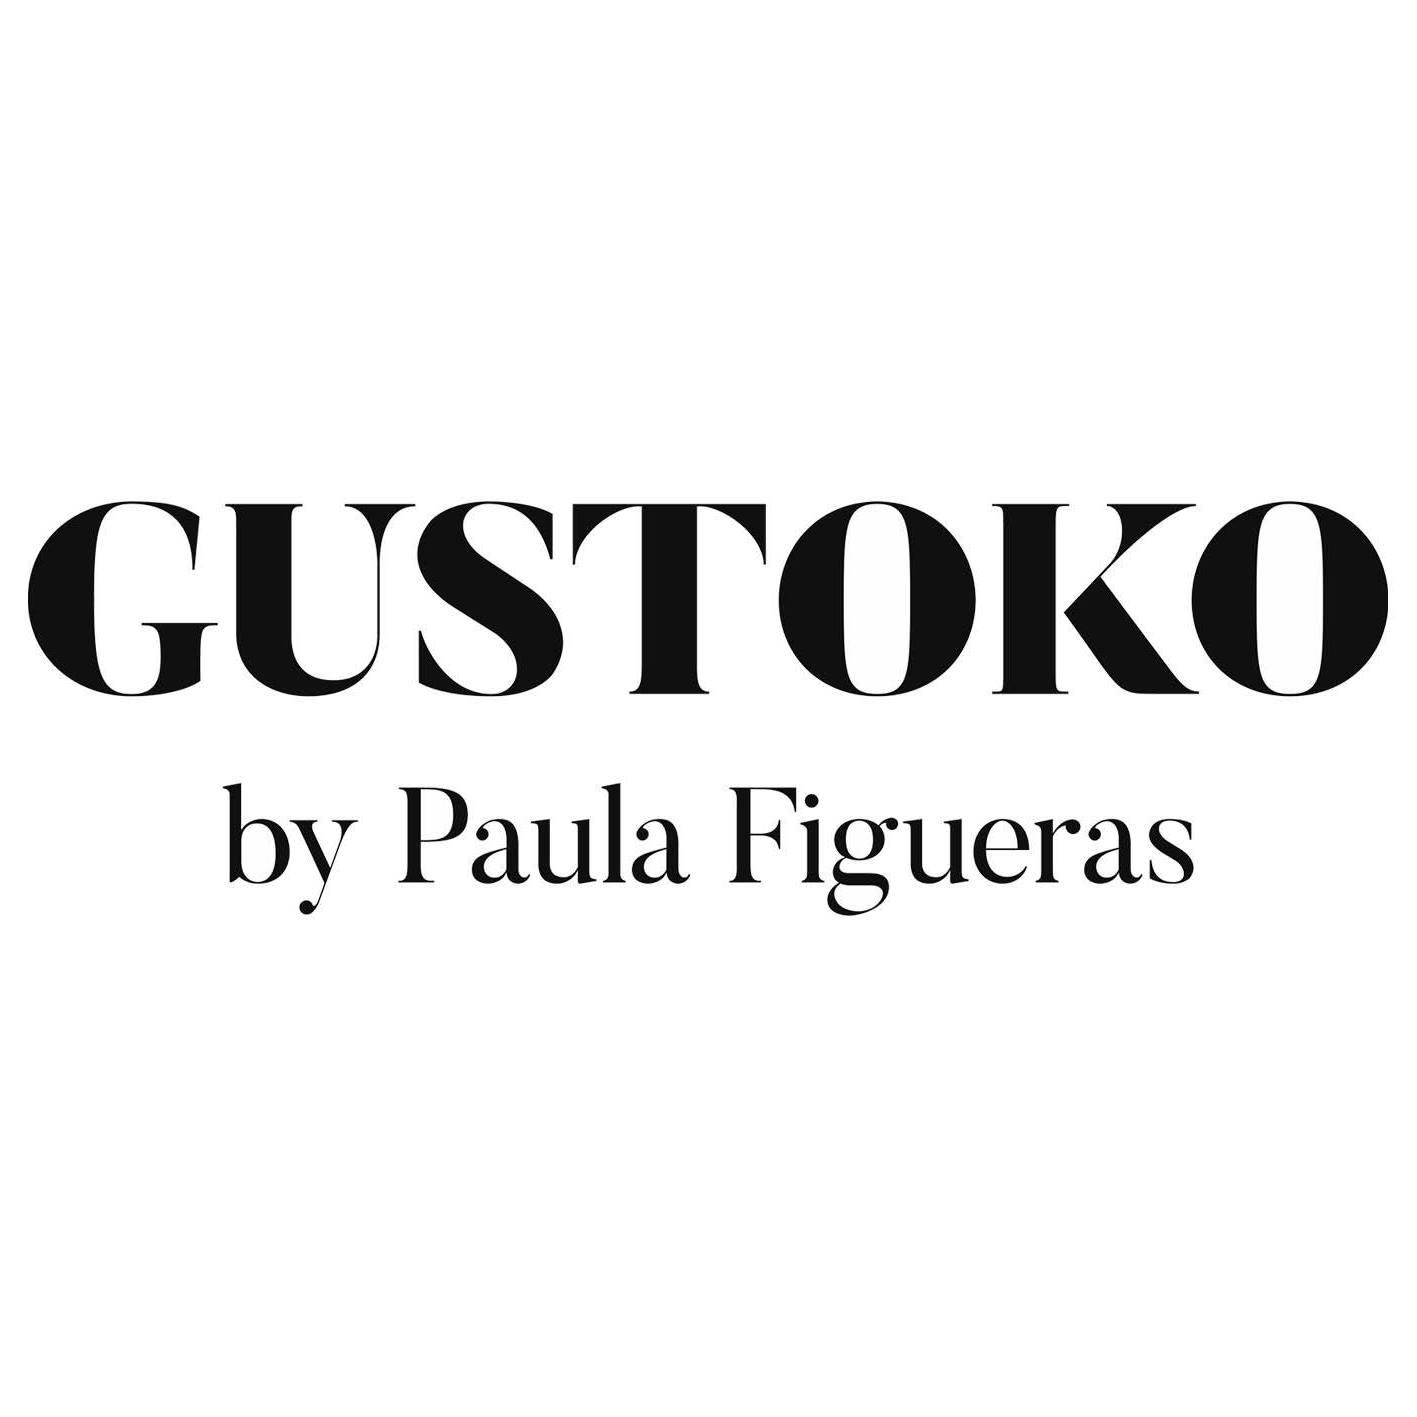 GUSTOKO by Paula Figueras